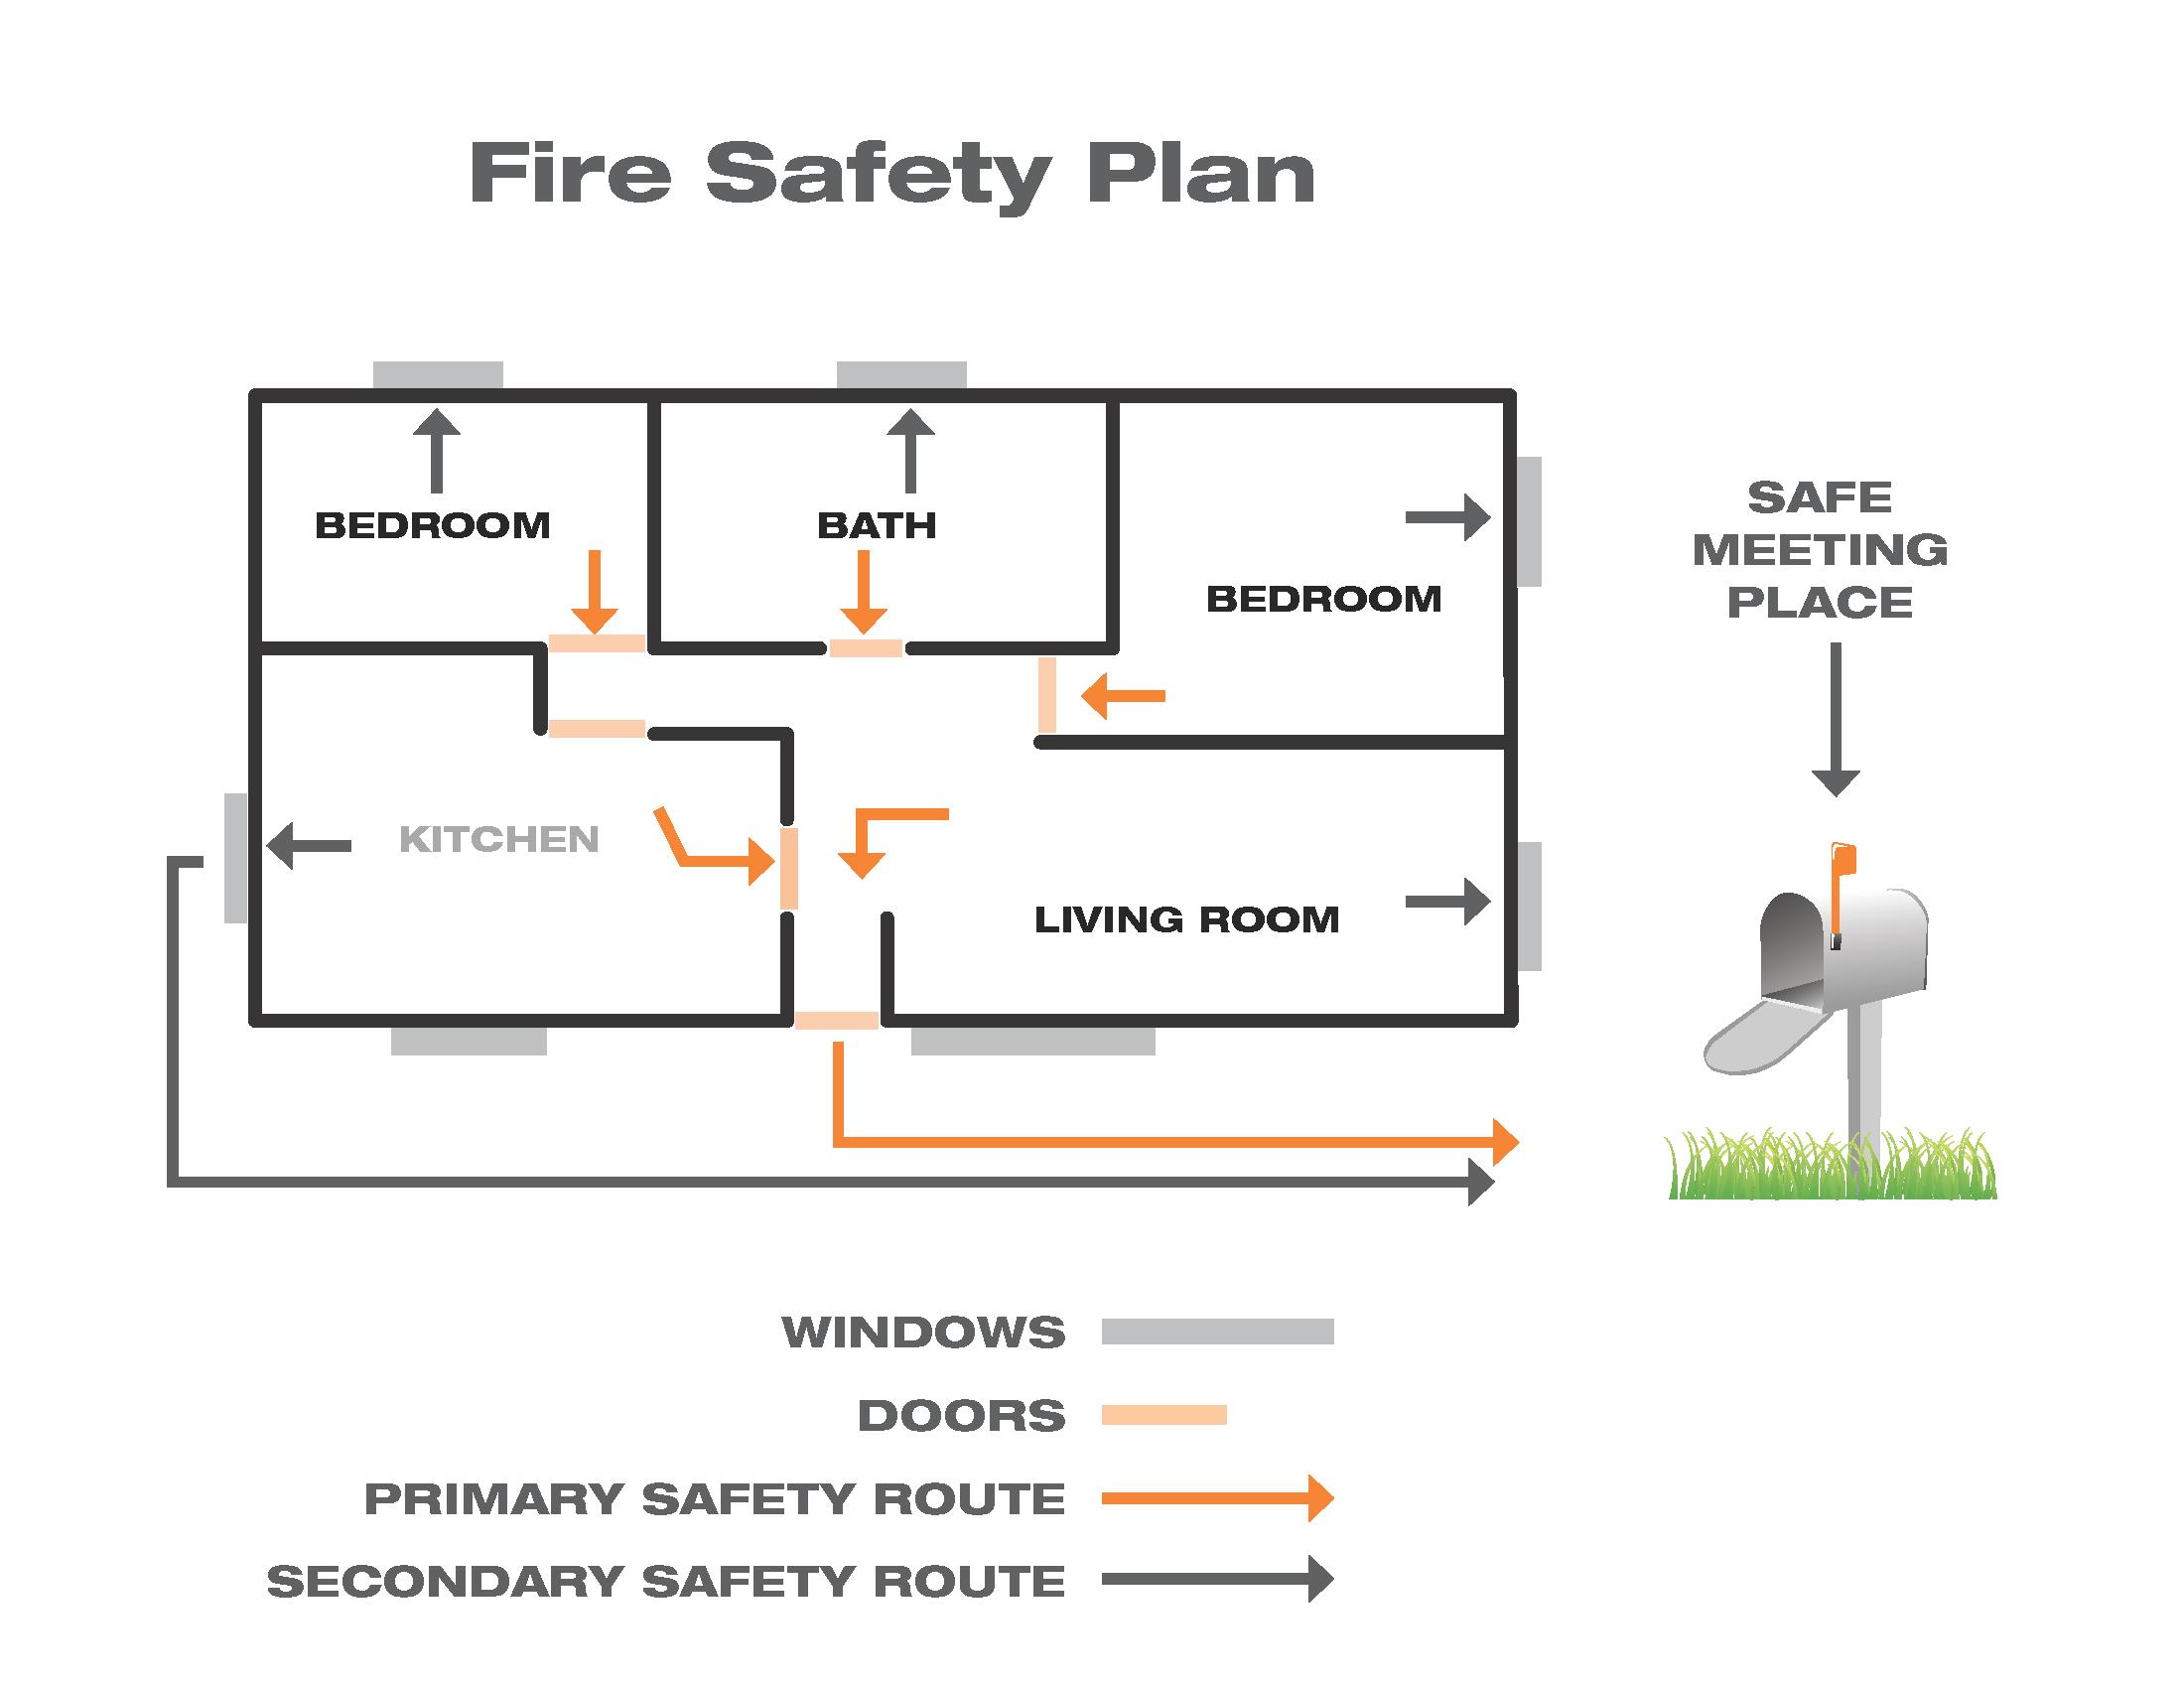 Promote Escape Plans to Improve Fire Safety